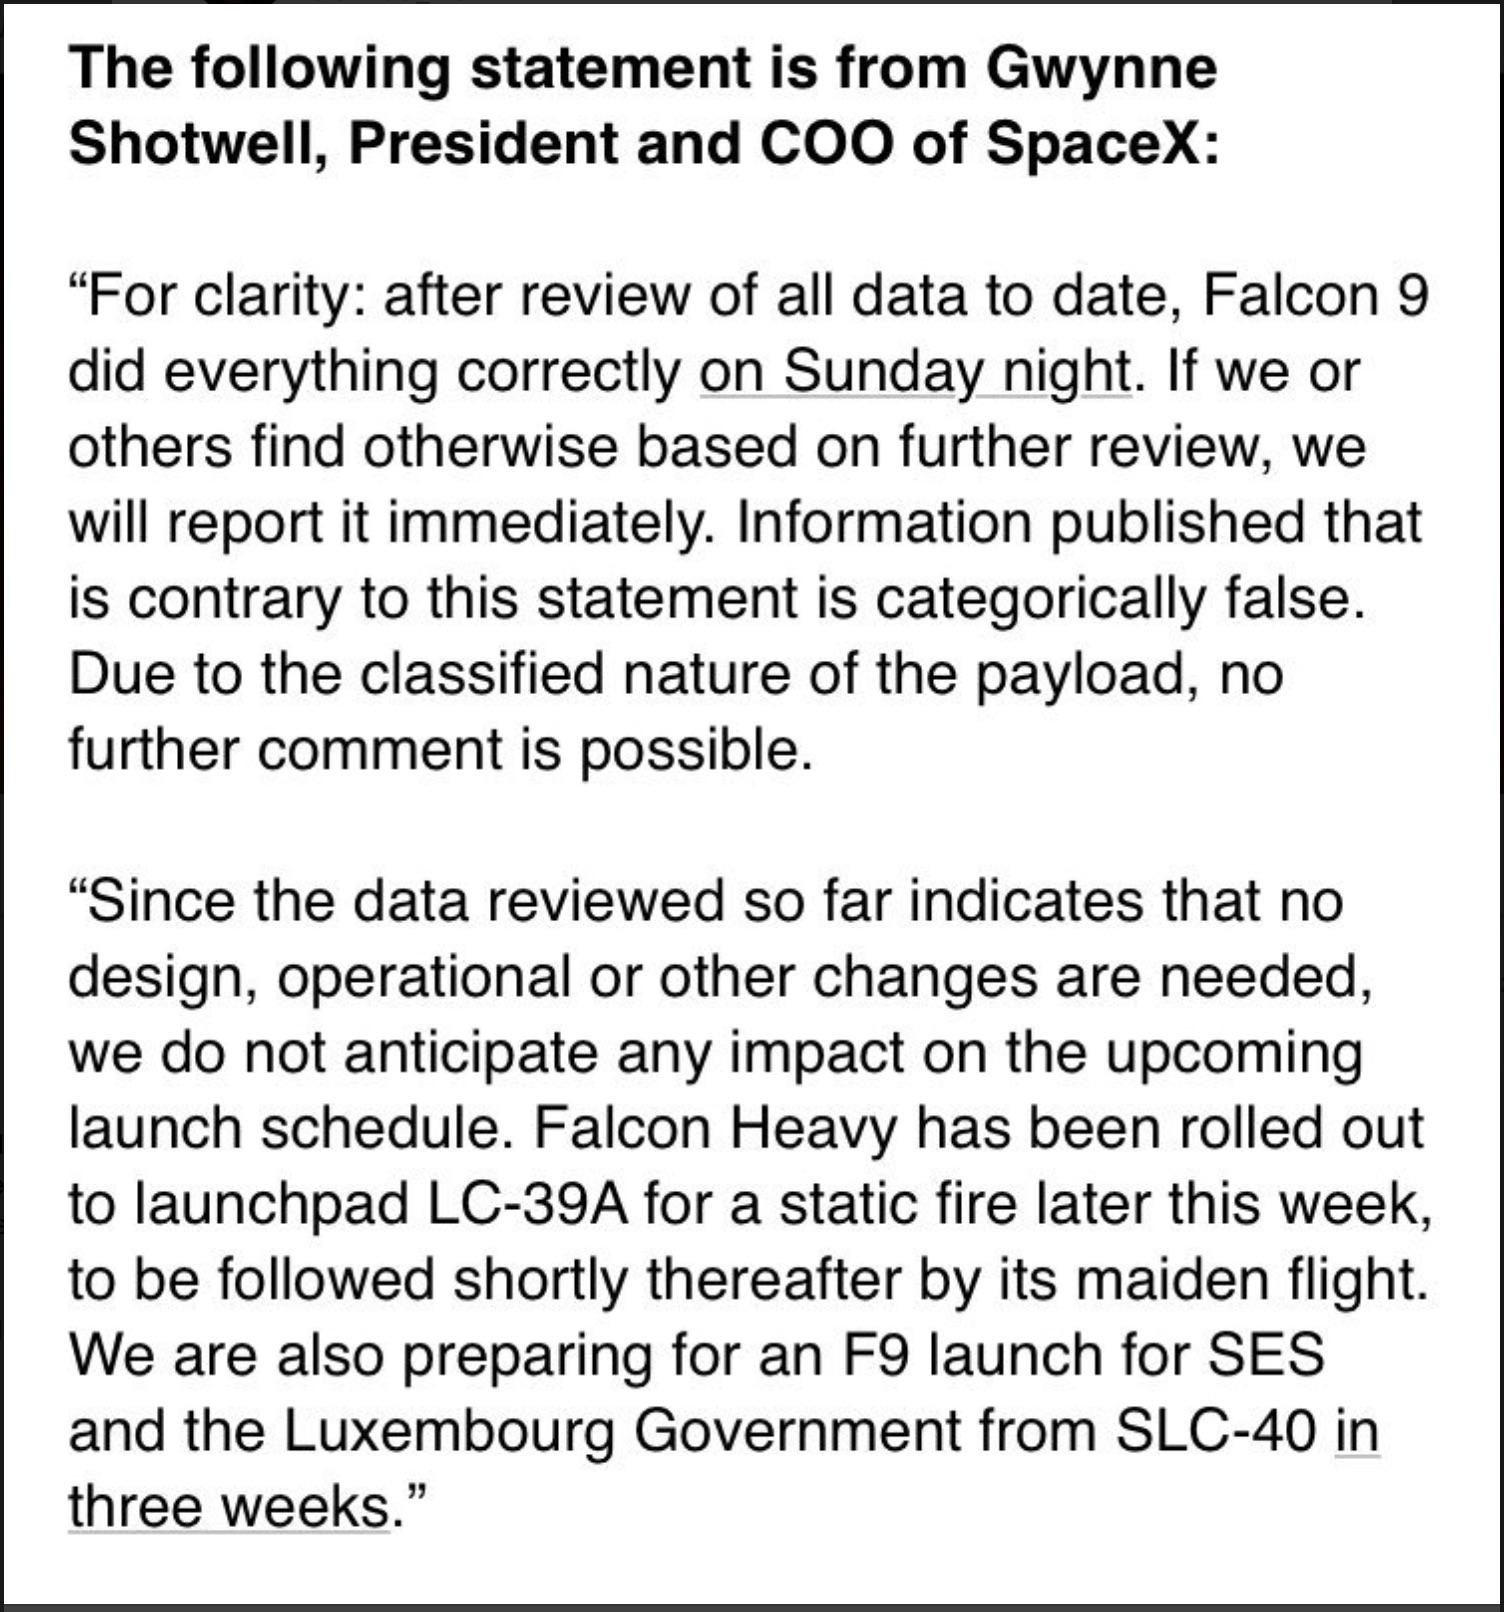 shotwell-disputes-spacex-zuma-rumor